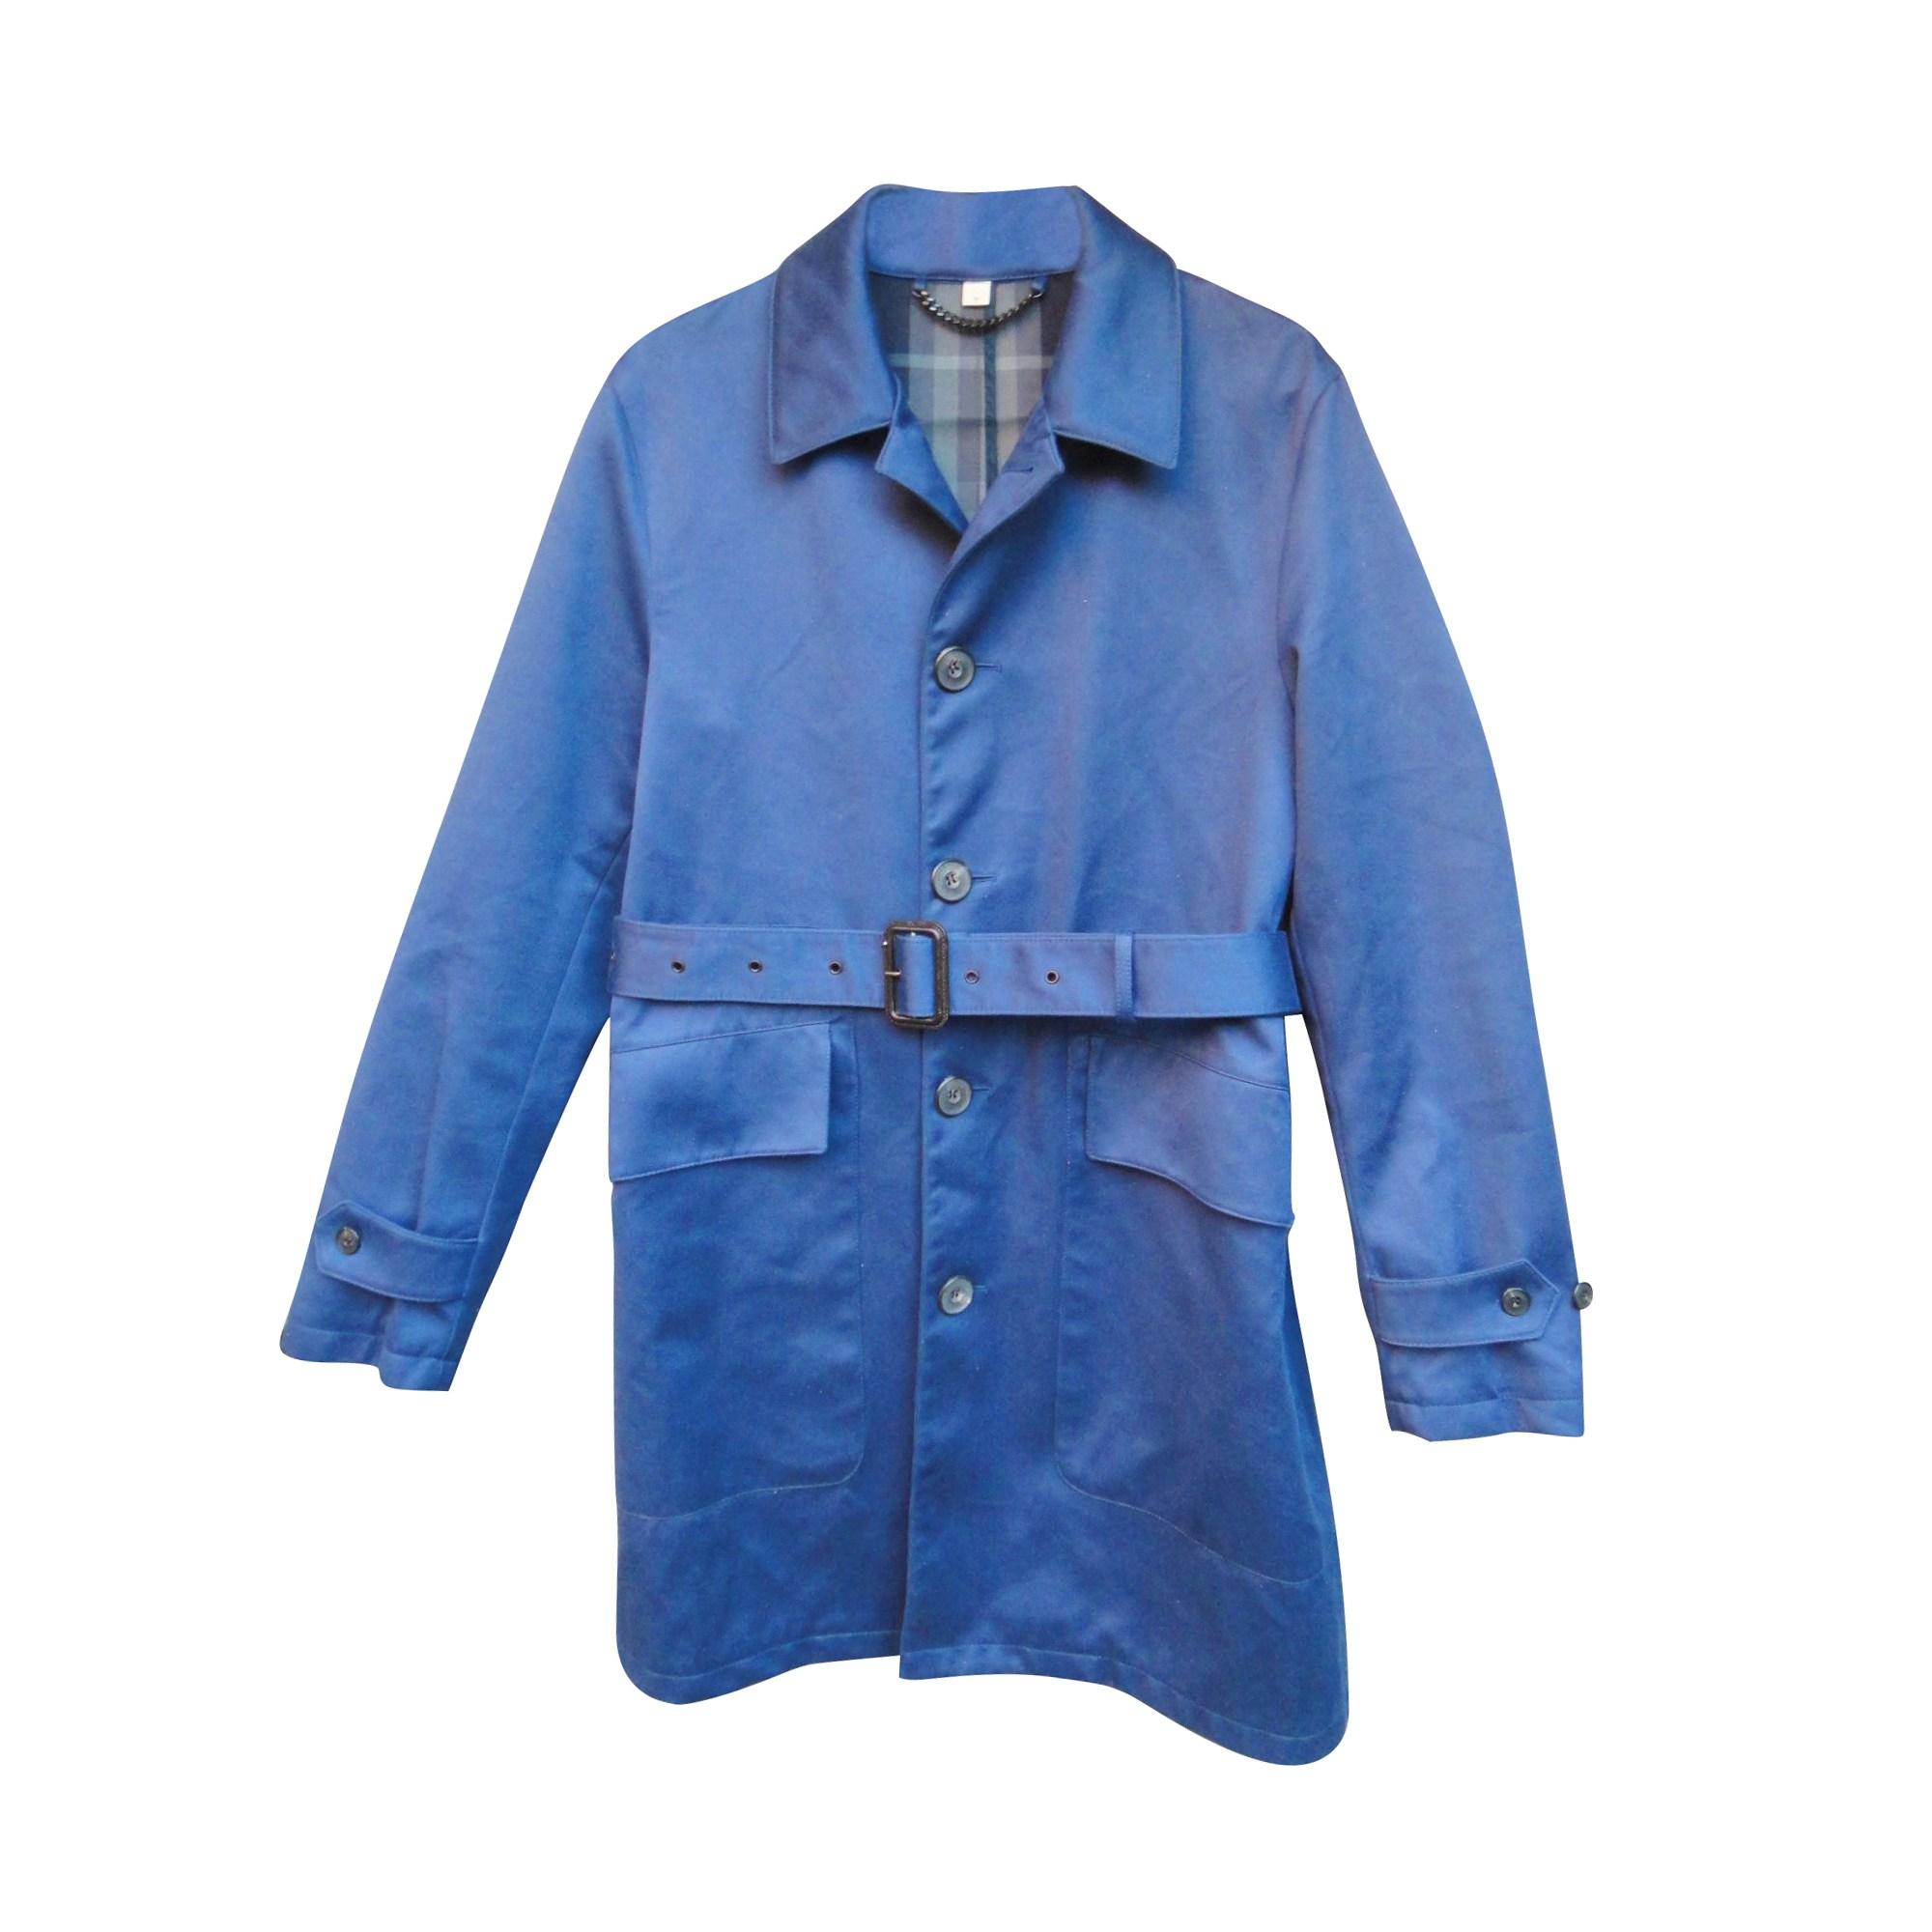 Imperméable, trench BURBERRY Bleu, bleu marine, bleu turquoise